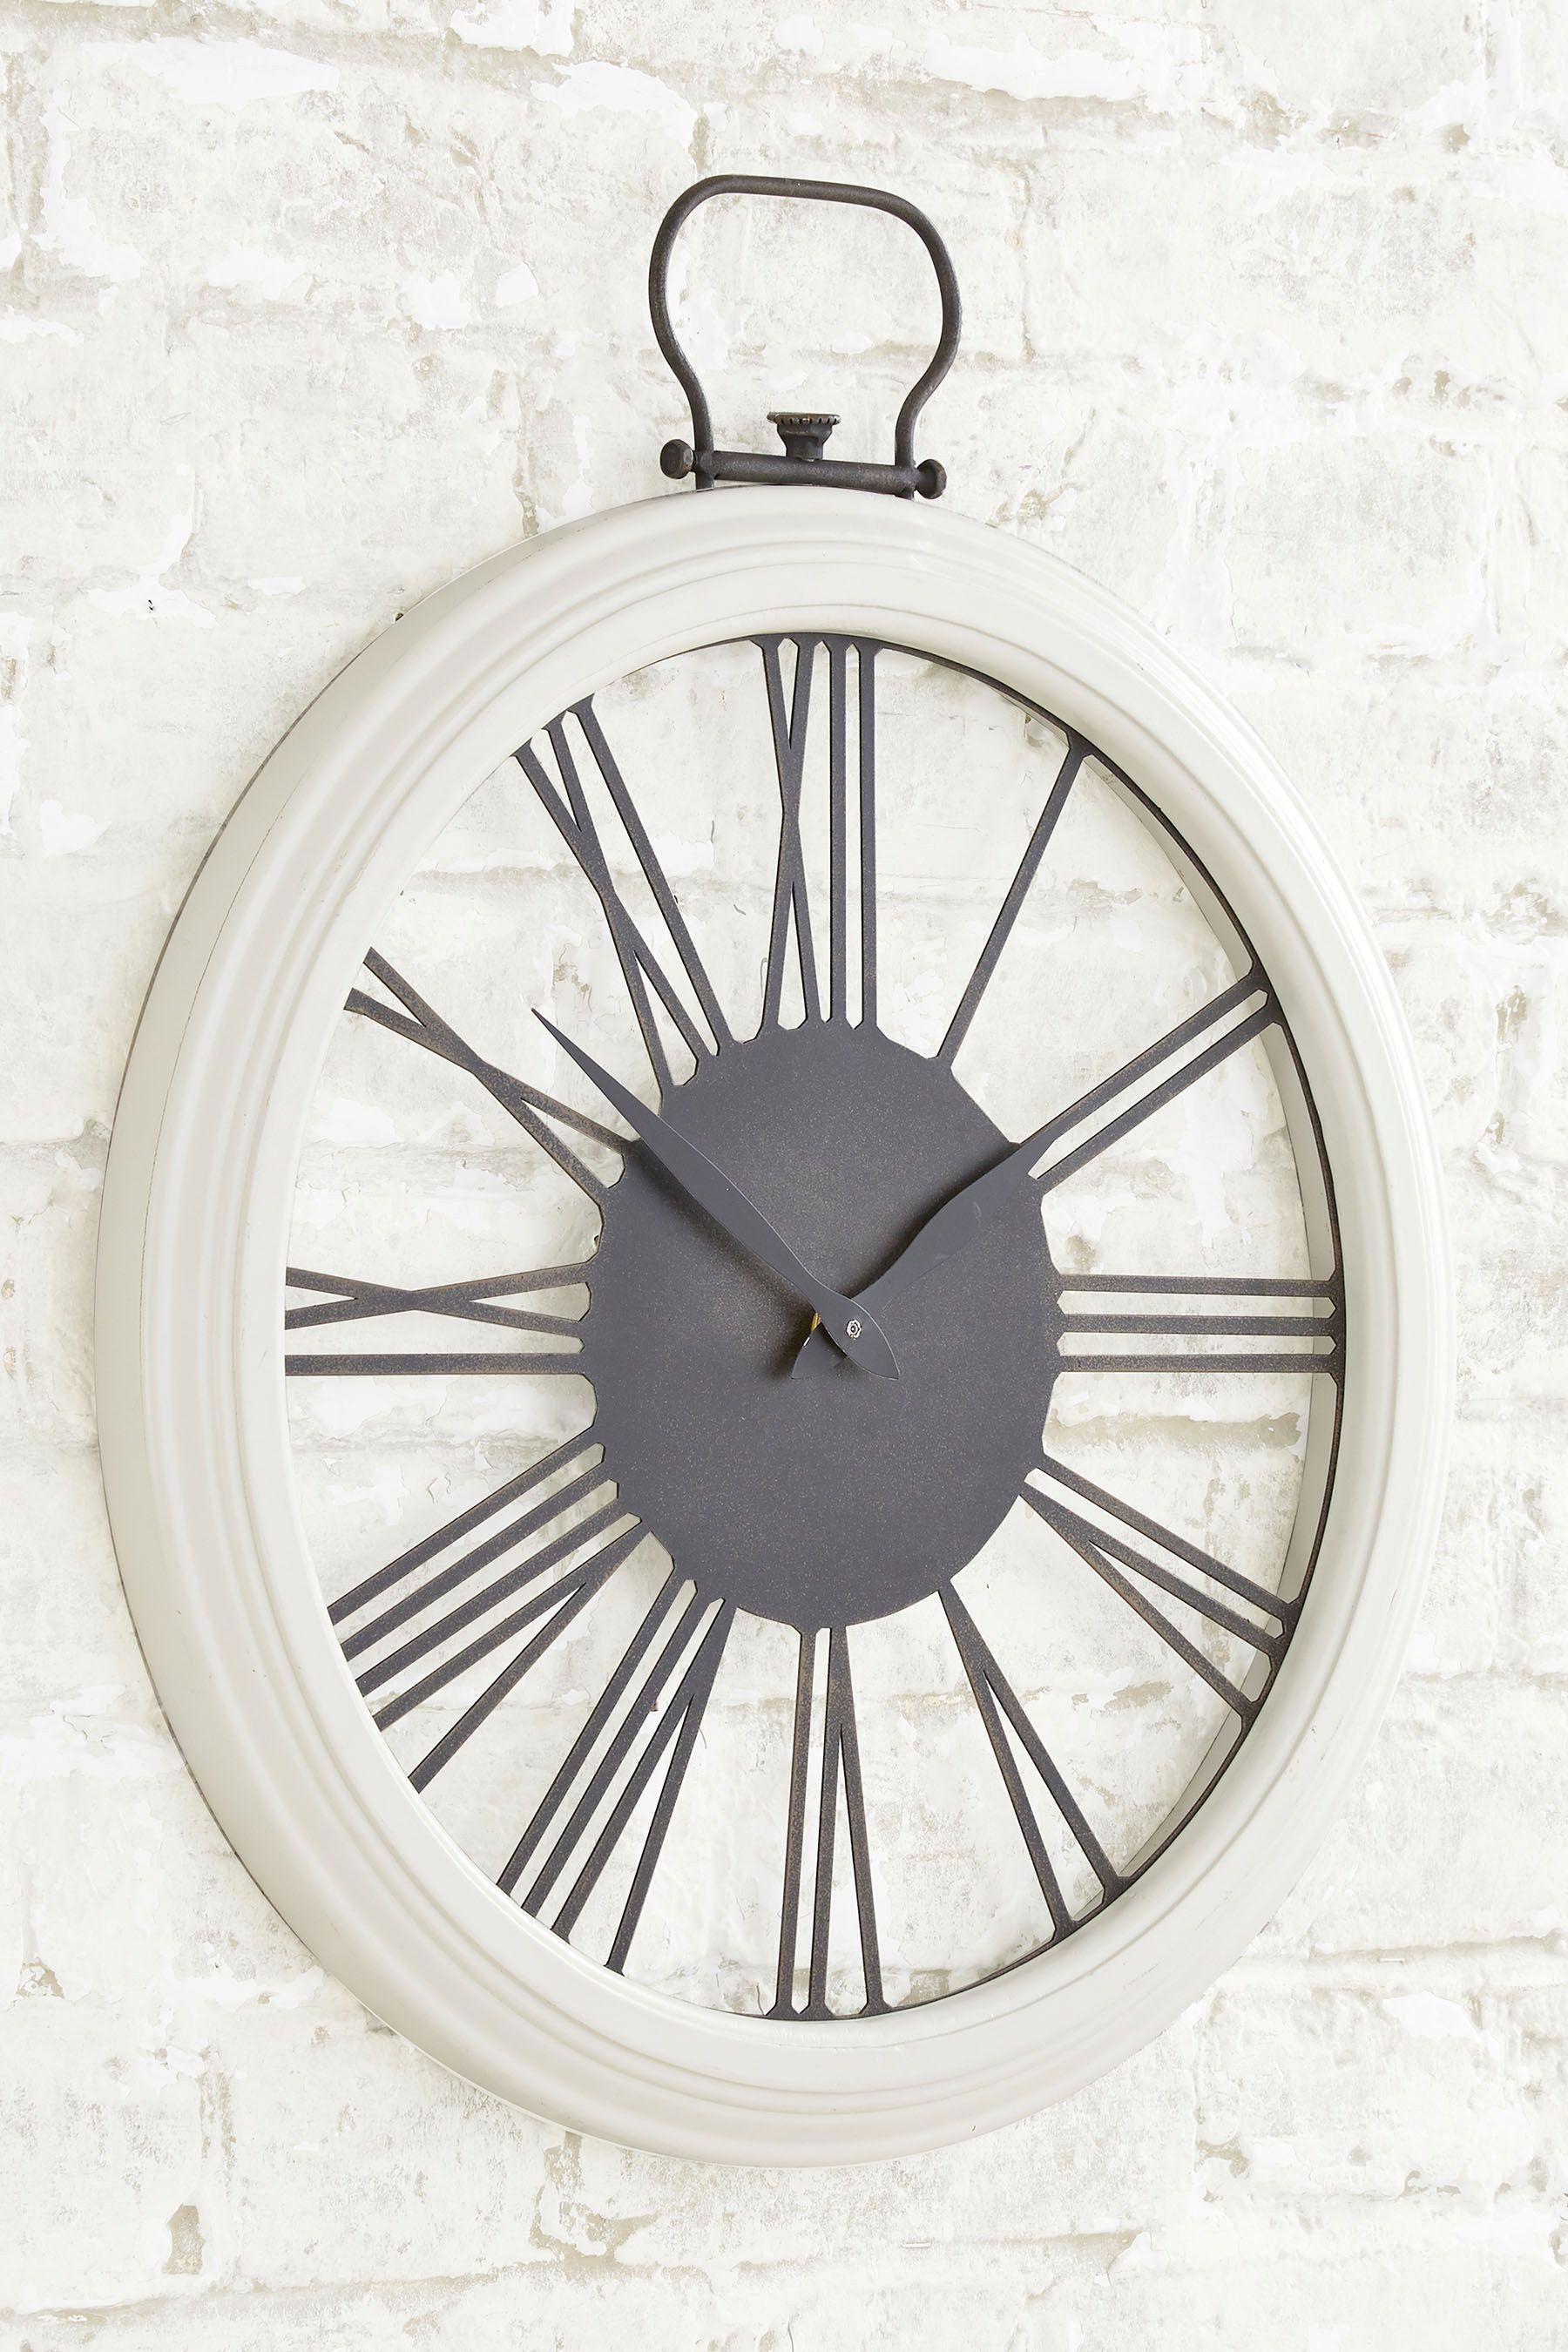 Next Wooden Wall Clock Cream Wall Clock Wall Clock Wooden Bedroom Wall Clock